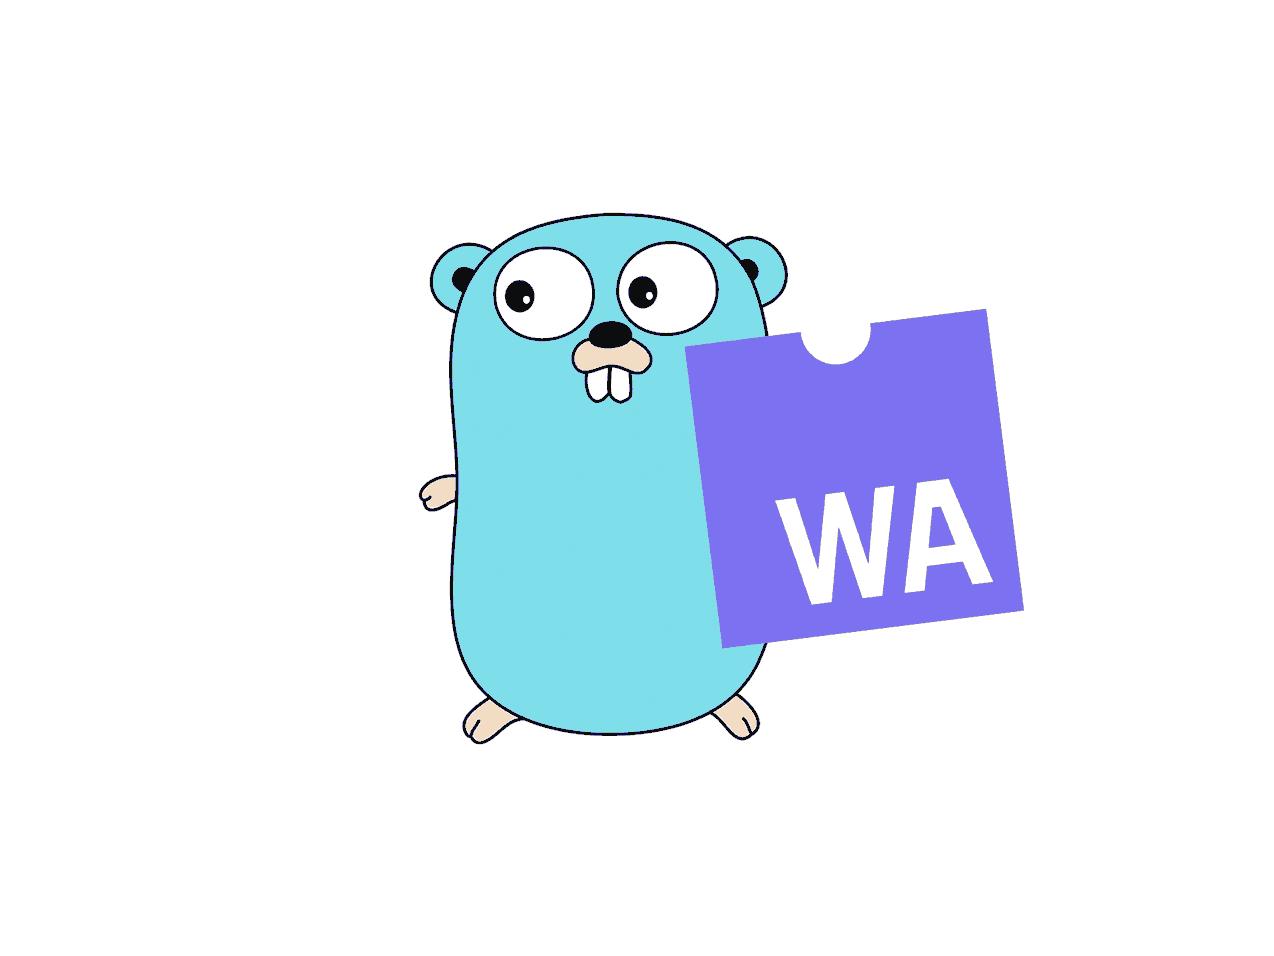 WebAssembly support lands in Go language: golang wasm/js